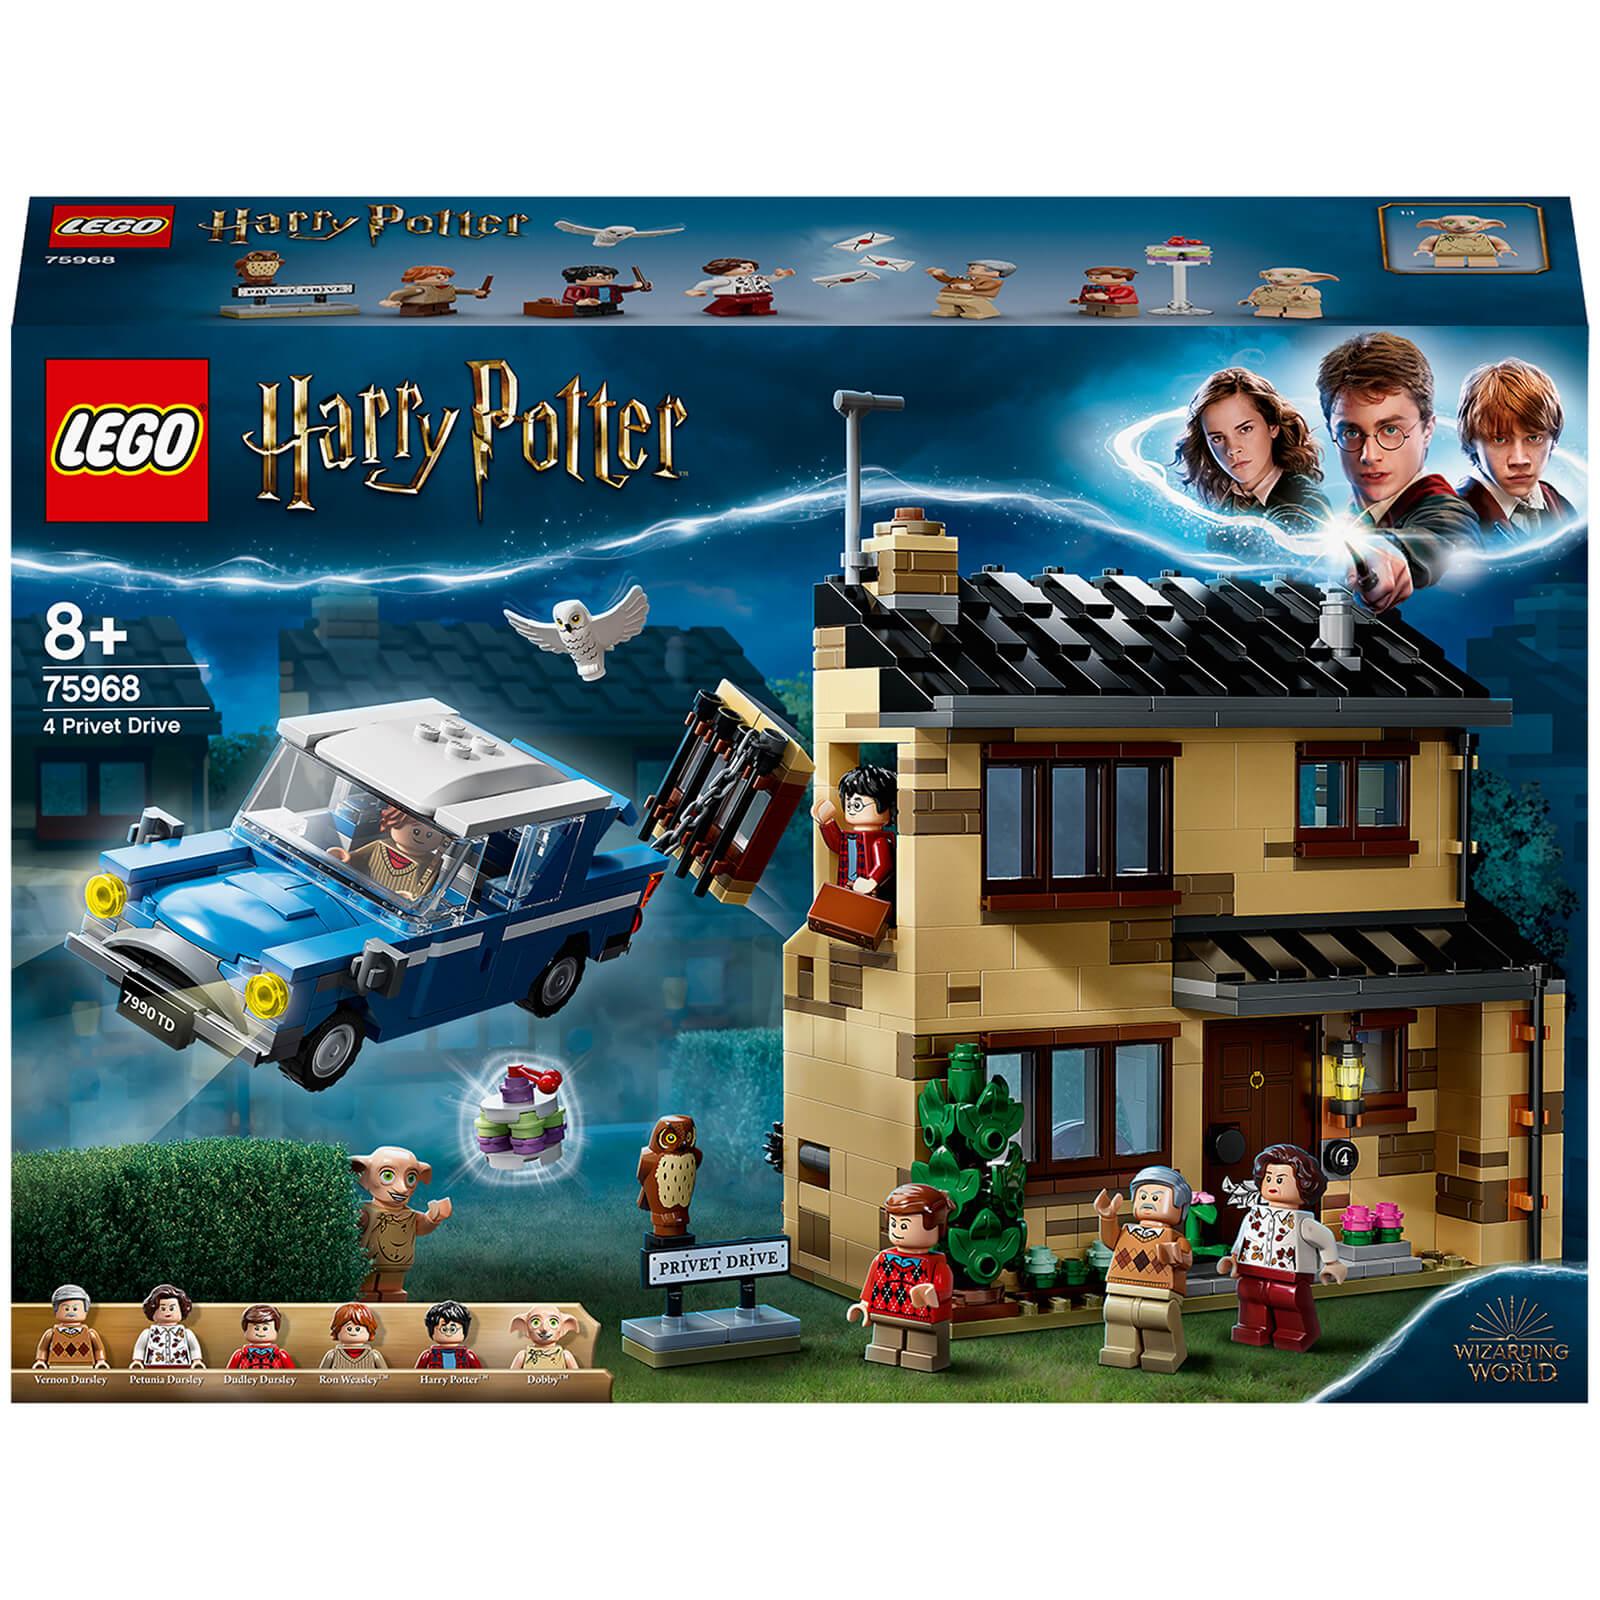 Image of LEGO Harry Potter - 4 Privet Drive Playset